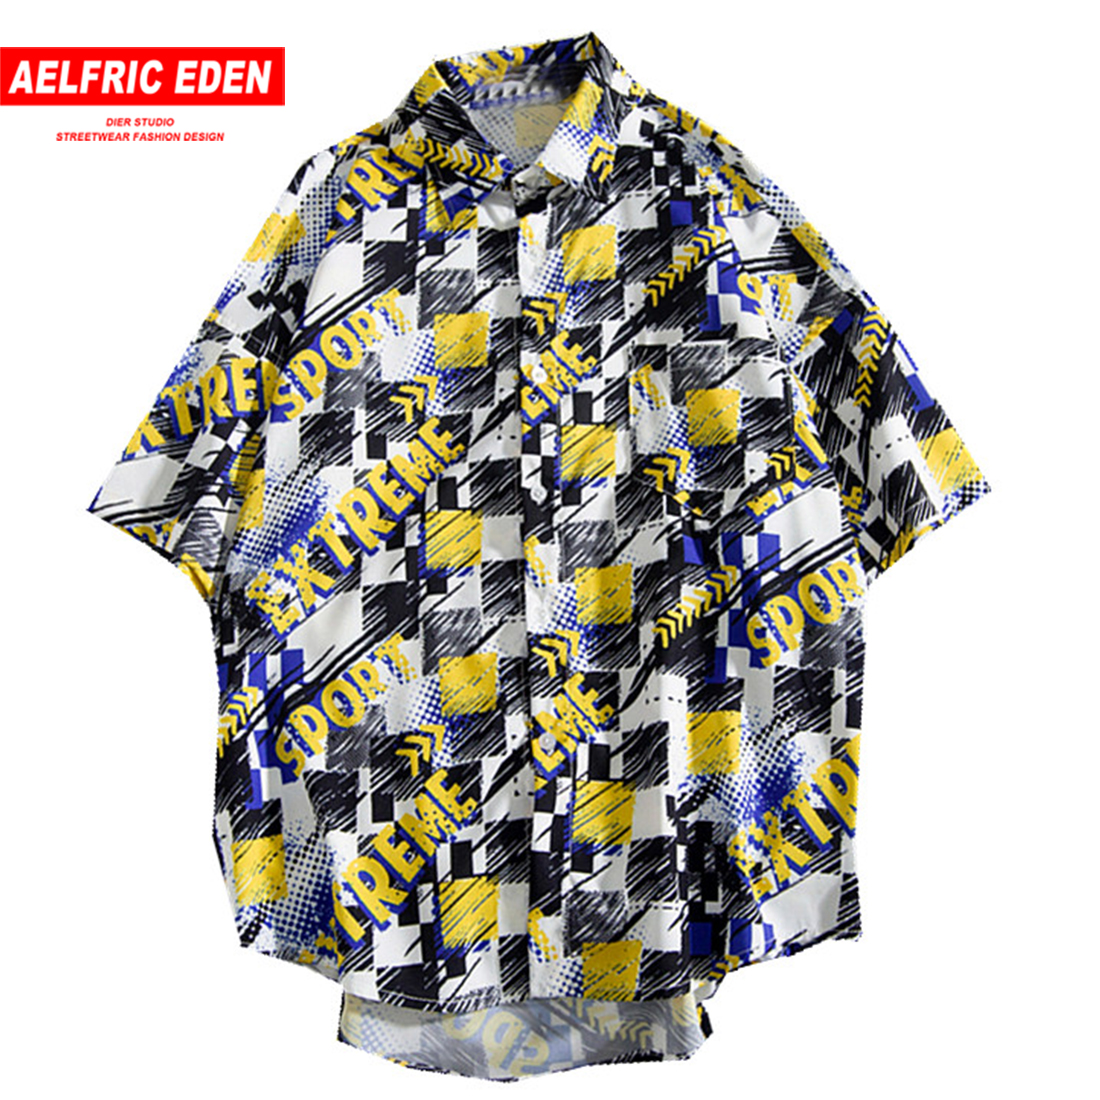 Aelfric Eden Men Shirts Summer Short Sleeve Letter Print Hawaiian Shirt Colorful Summer Streetwear Hip Hop Shirts Slim Fit Tops hoodie